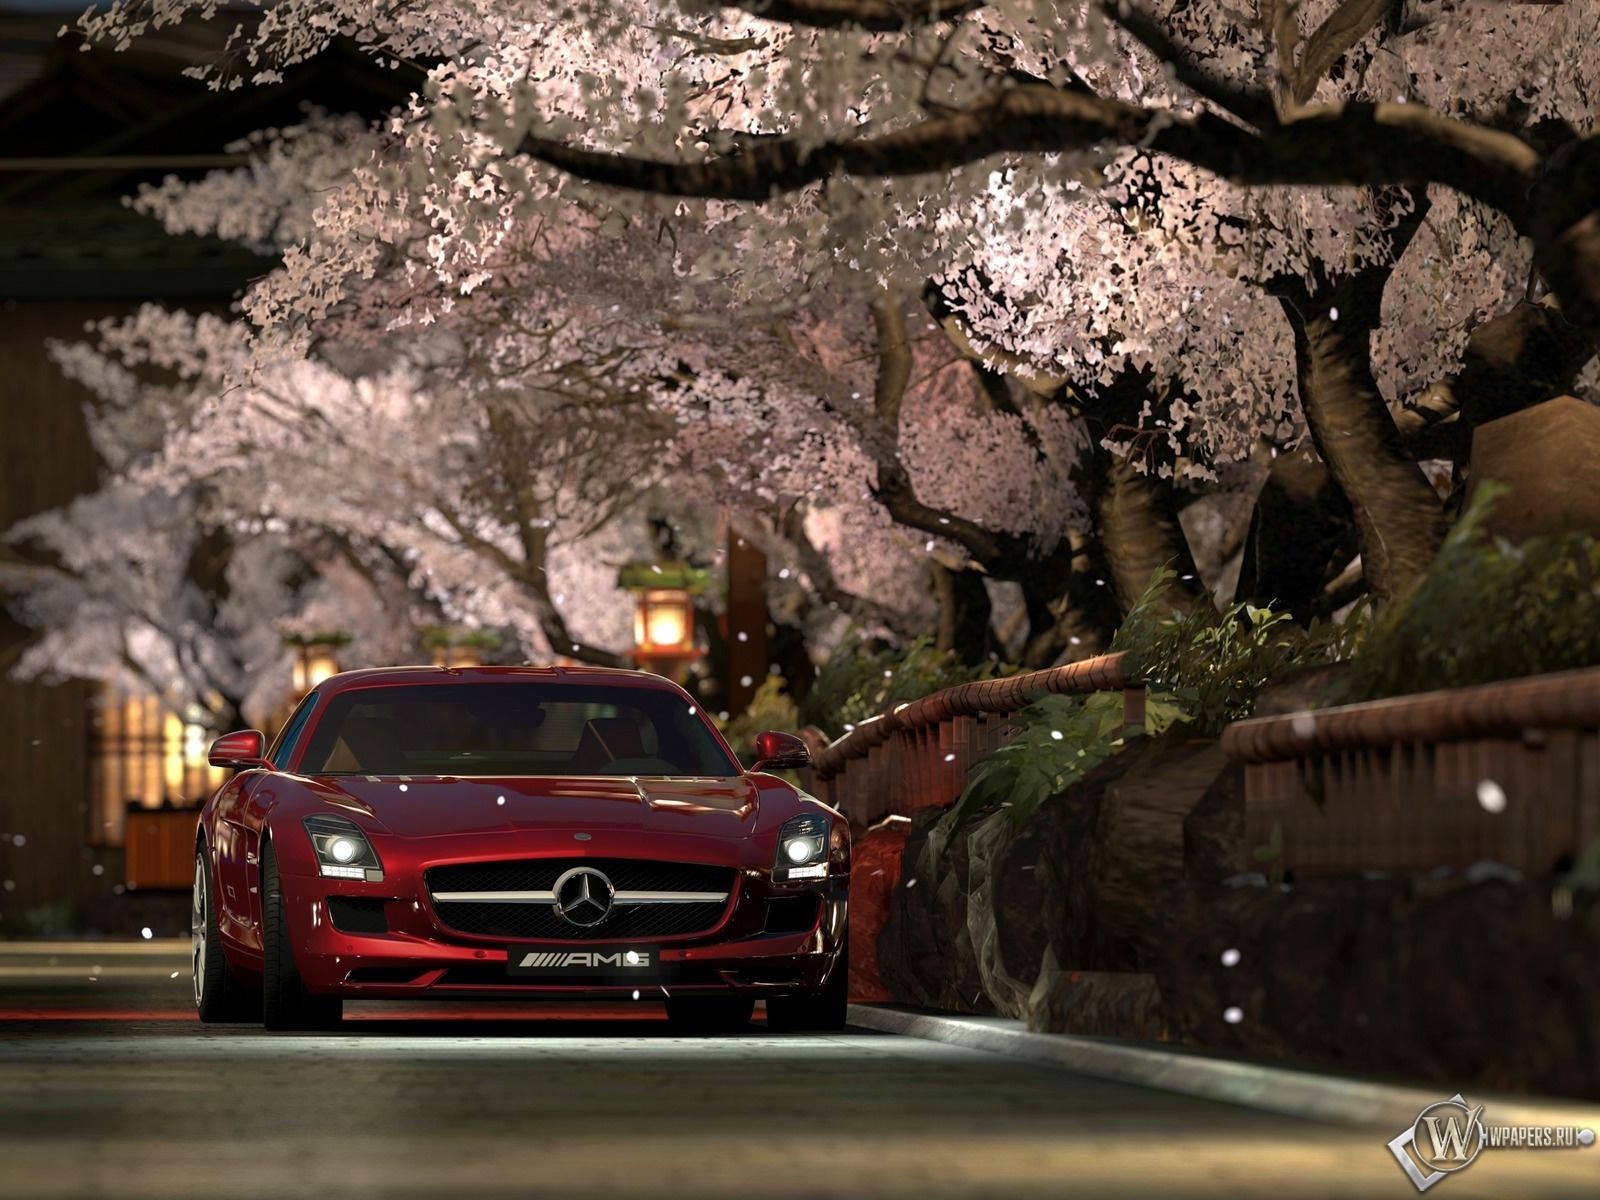 Turismo 5 и сакура мерседес обоев 10 сакура